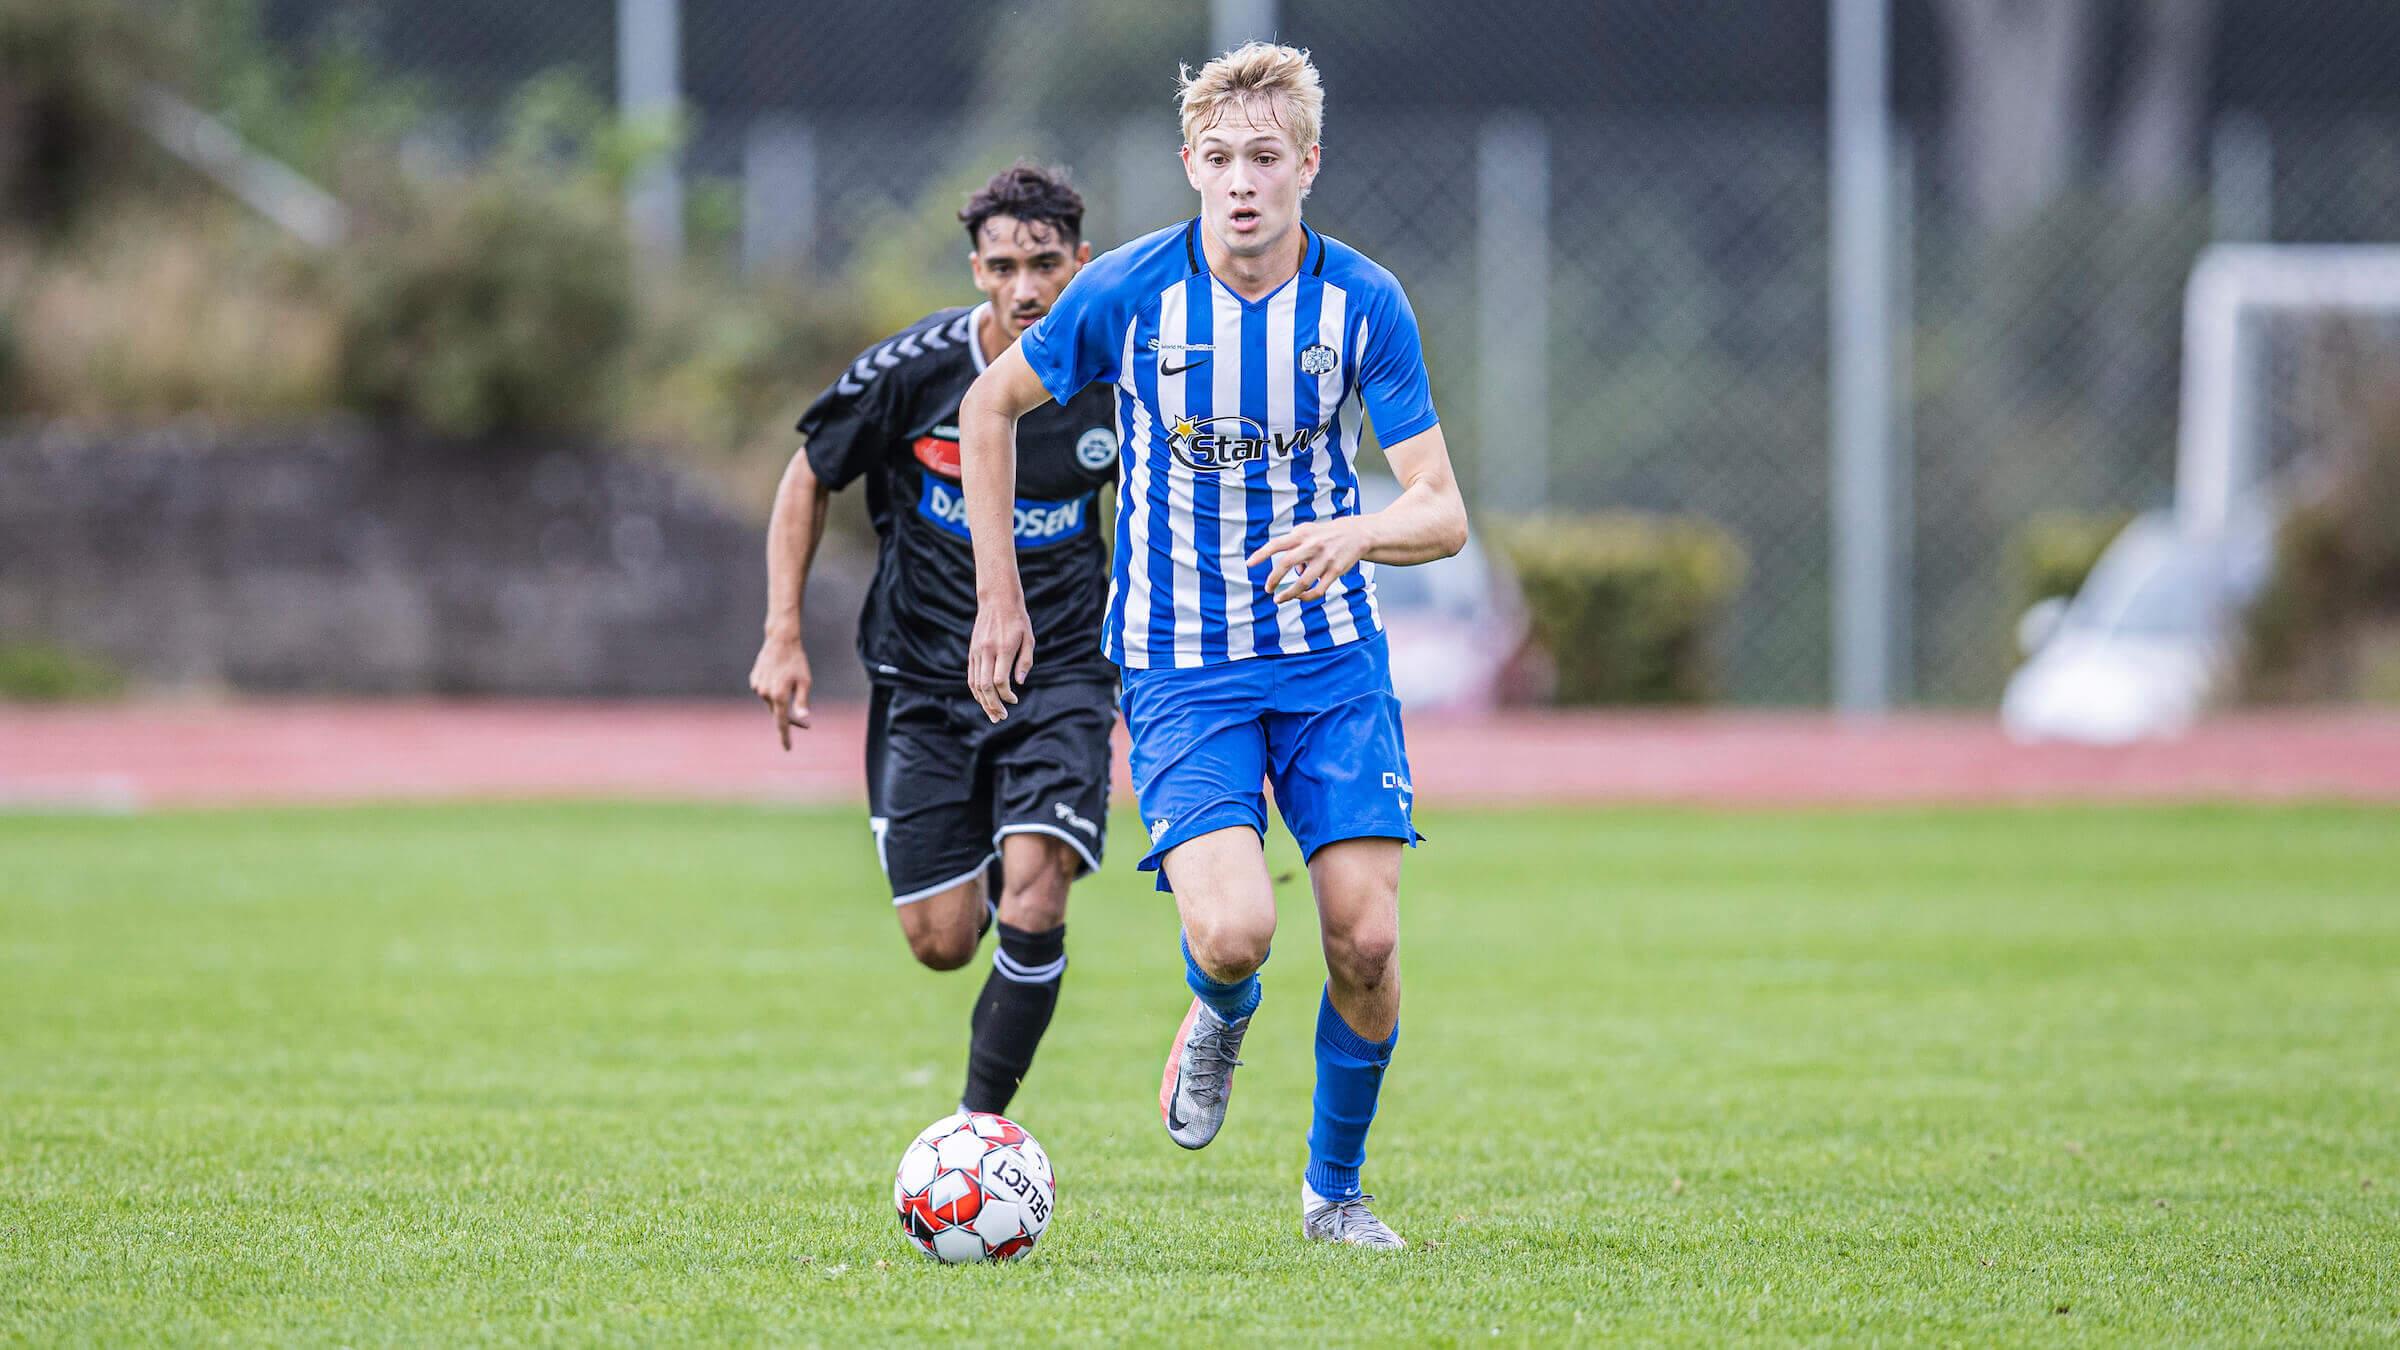 Rejnhold dobbelt målscorer i U19-sejr